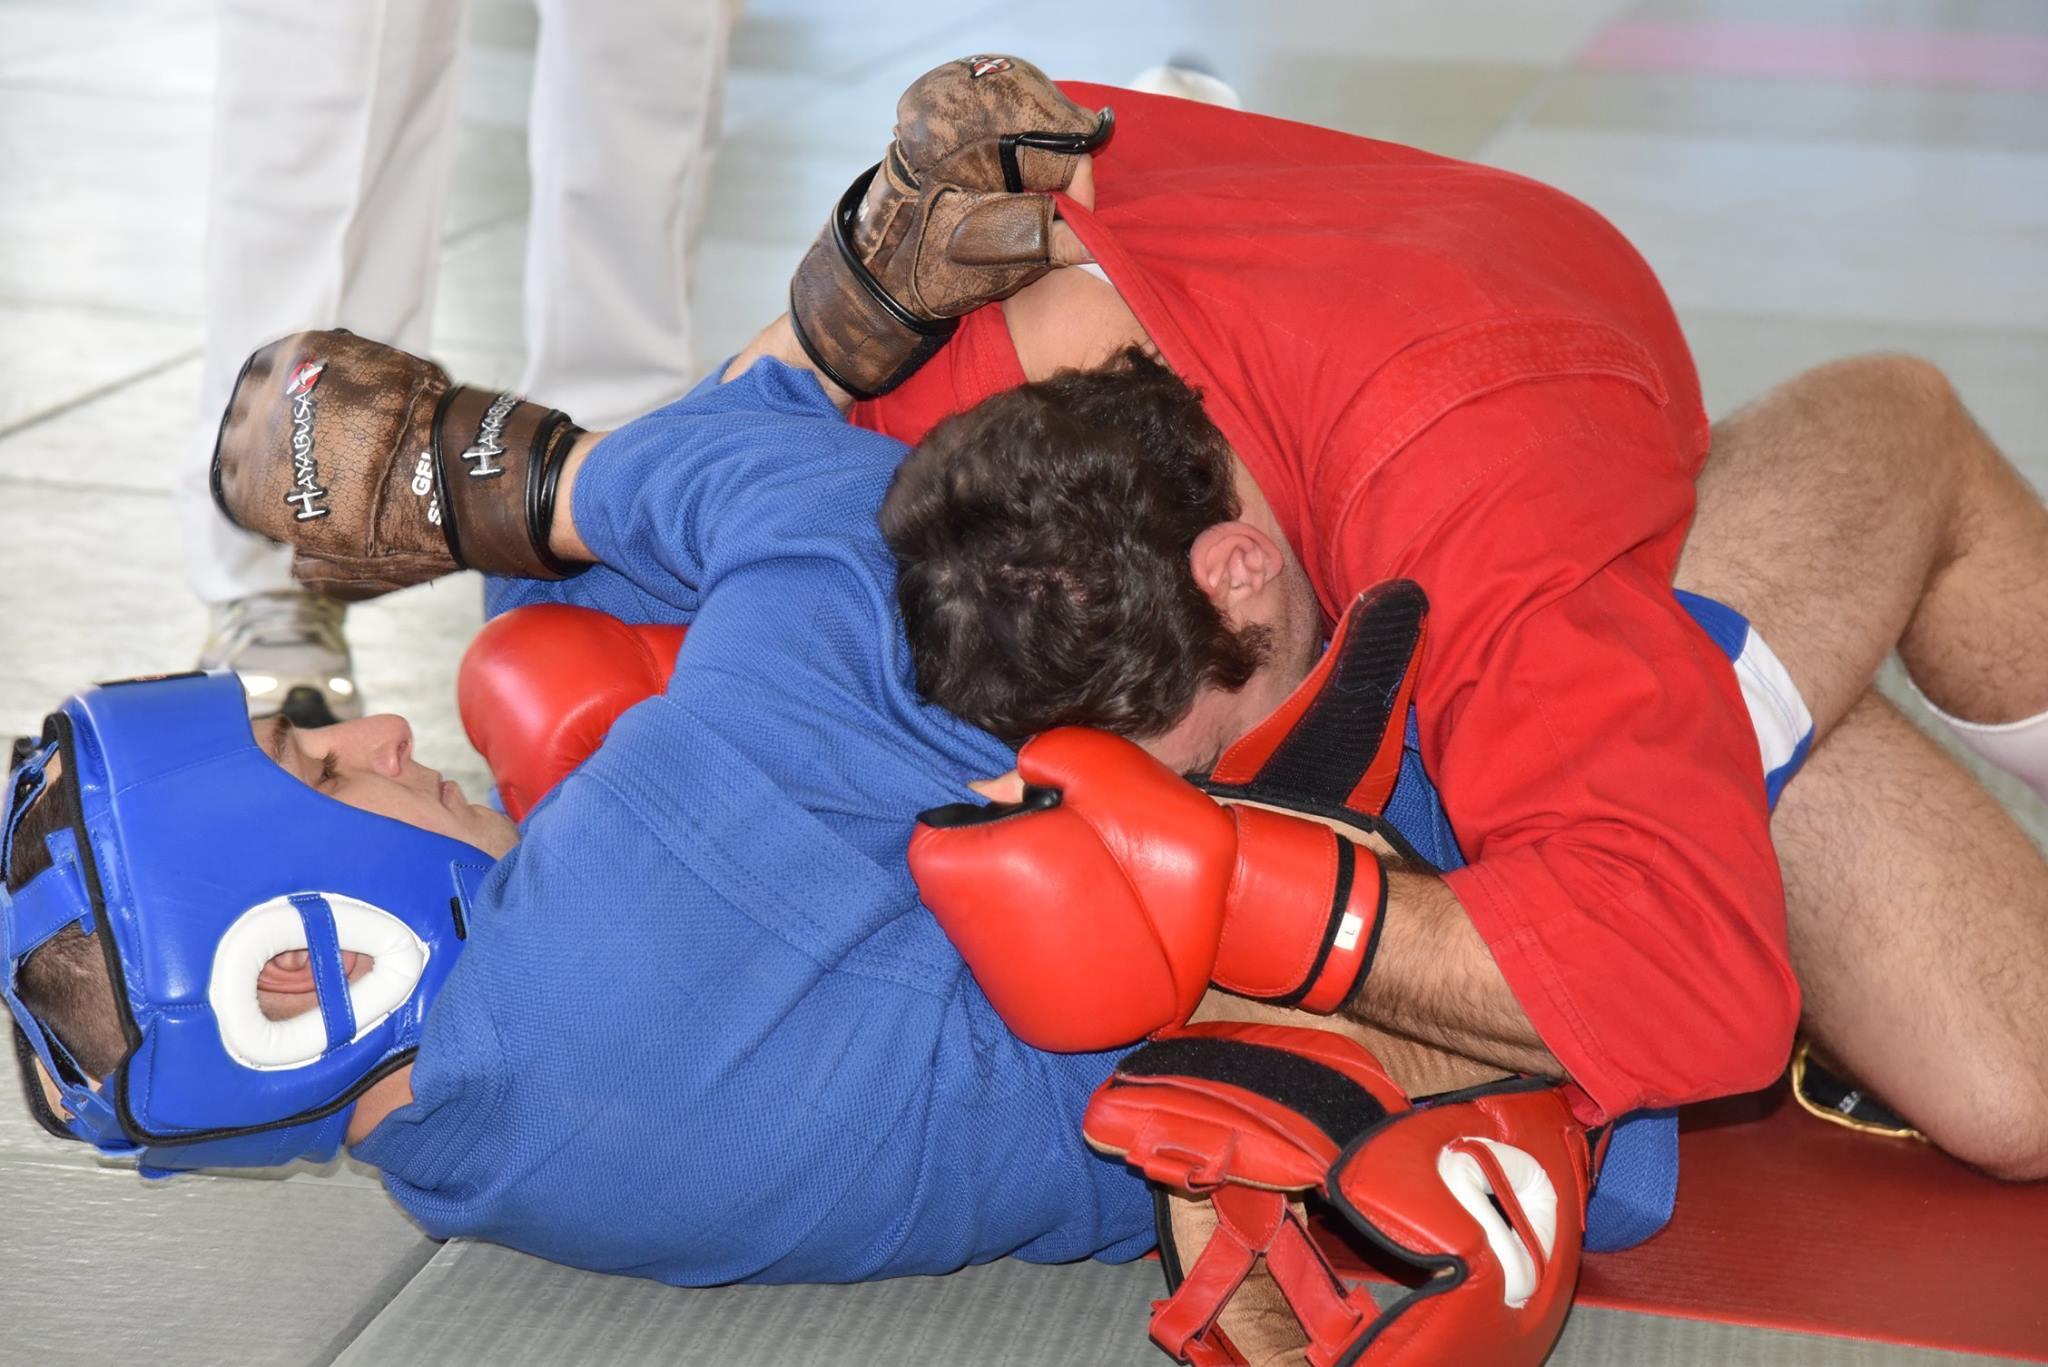 Lupta corp la corp din cadrul Spartachiadei CSC Dinamo 20185